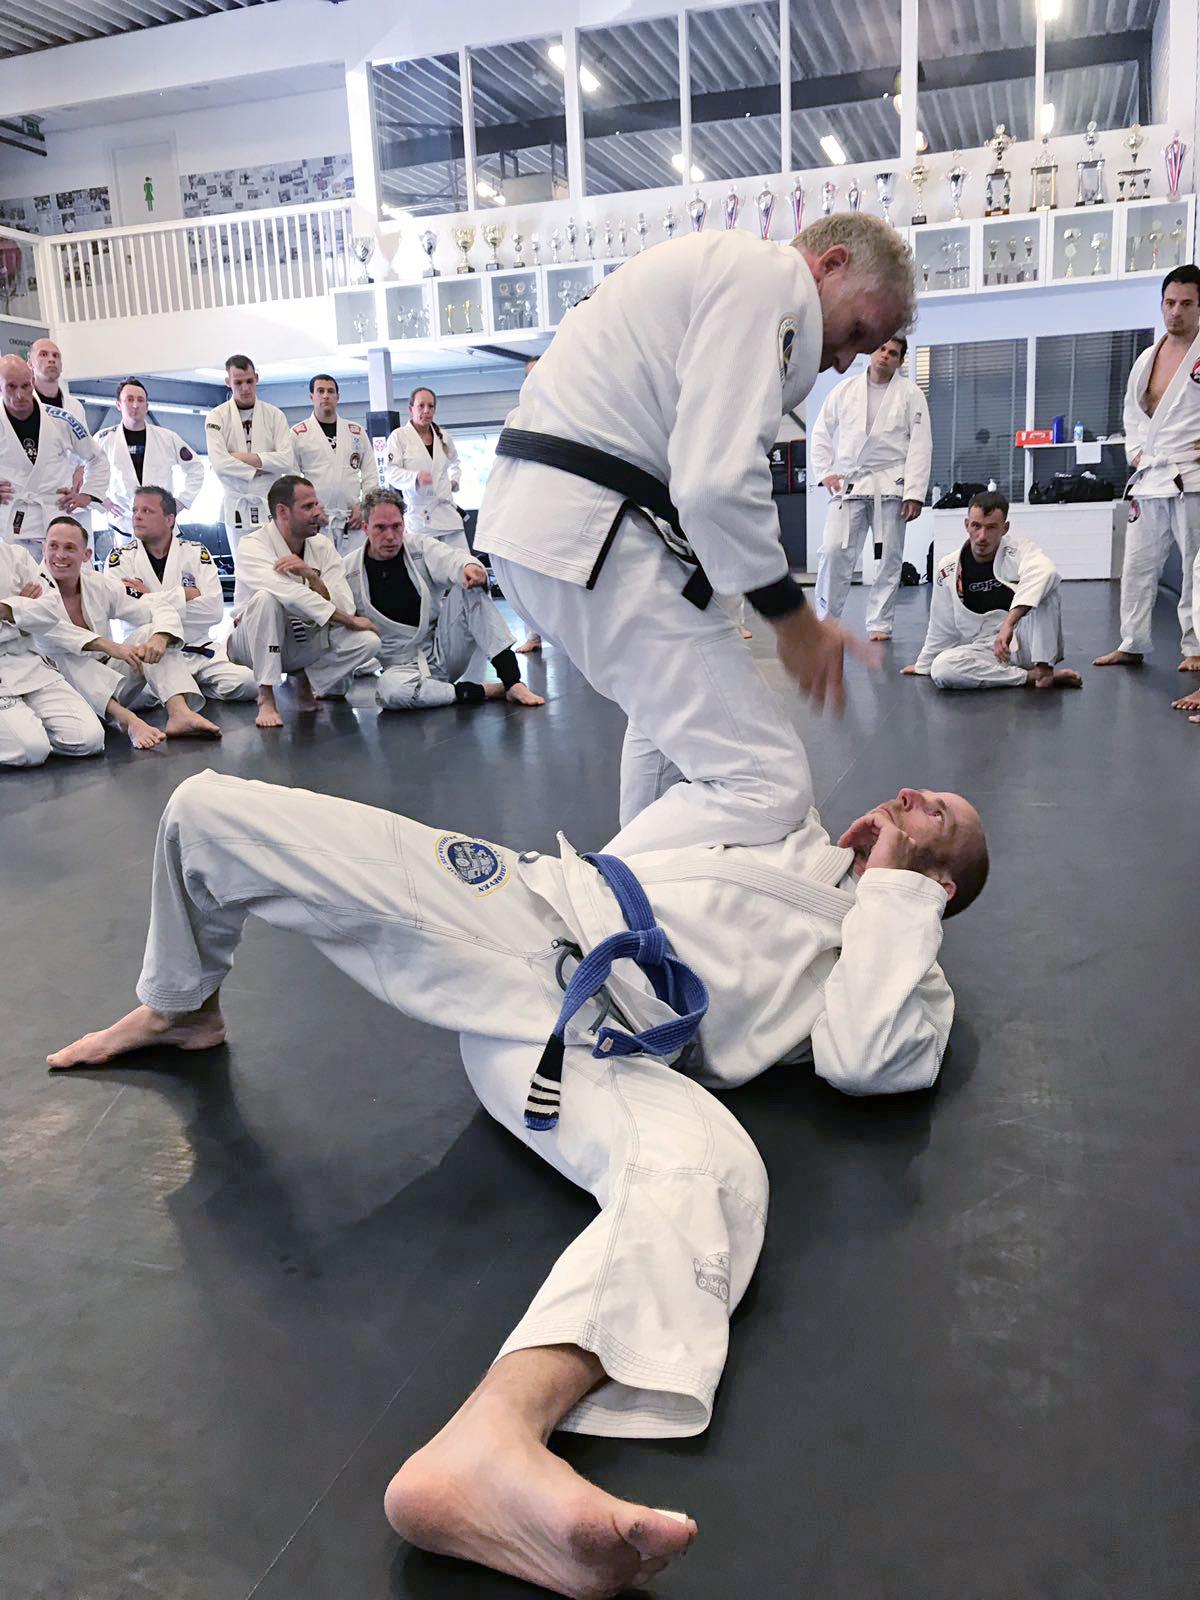 harold-harder_seminar_gracie-jiu-jitsu-gouda_bjj-braziliaans-jiu-jitsu-zelfverdediging_selfdefense-4